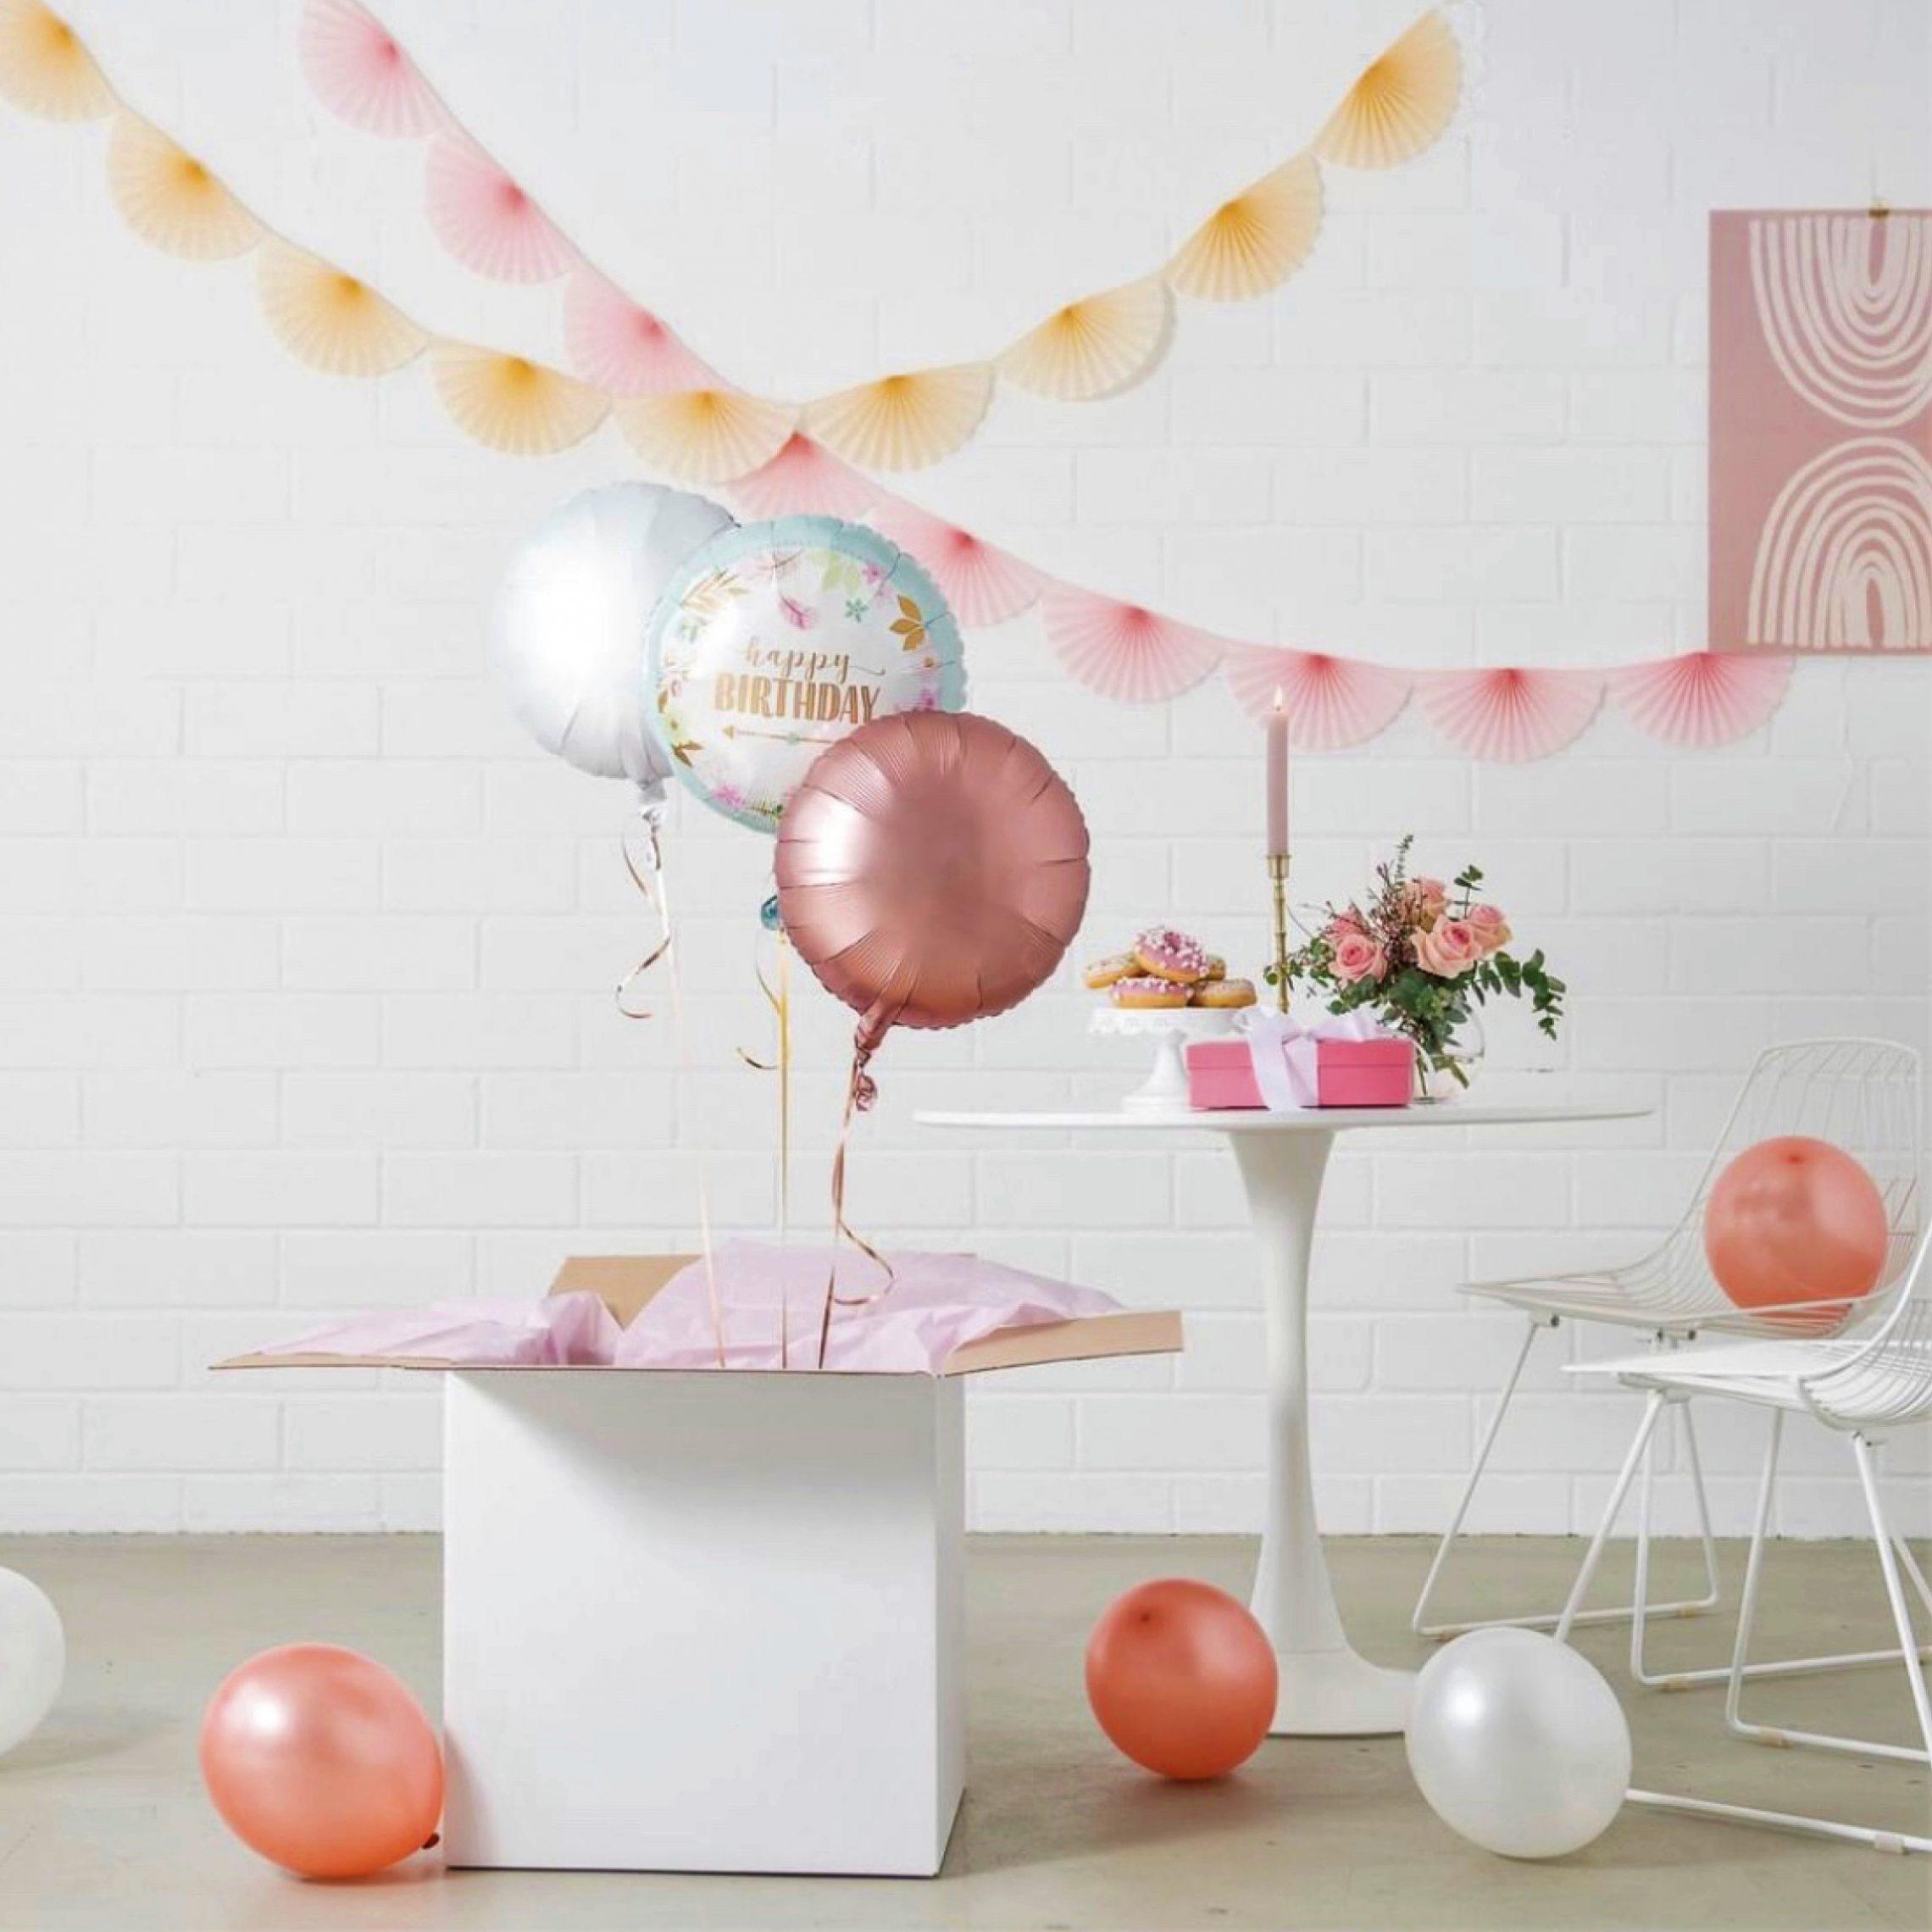 Style Hannover Balloon Fantasy Box B scaled - BALLOON FANTASY - Lieferangebote & mehr